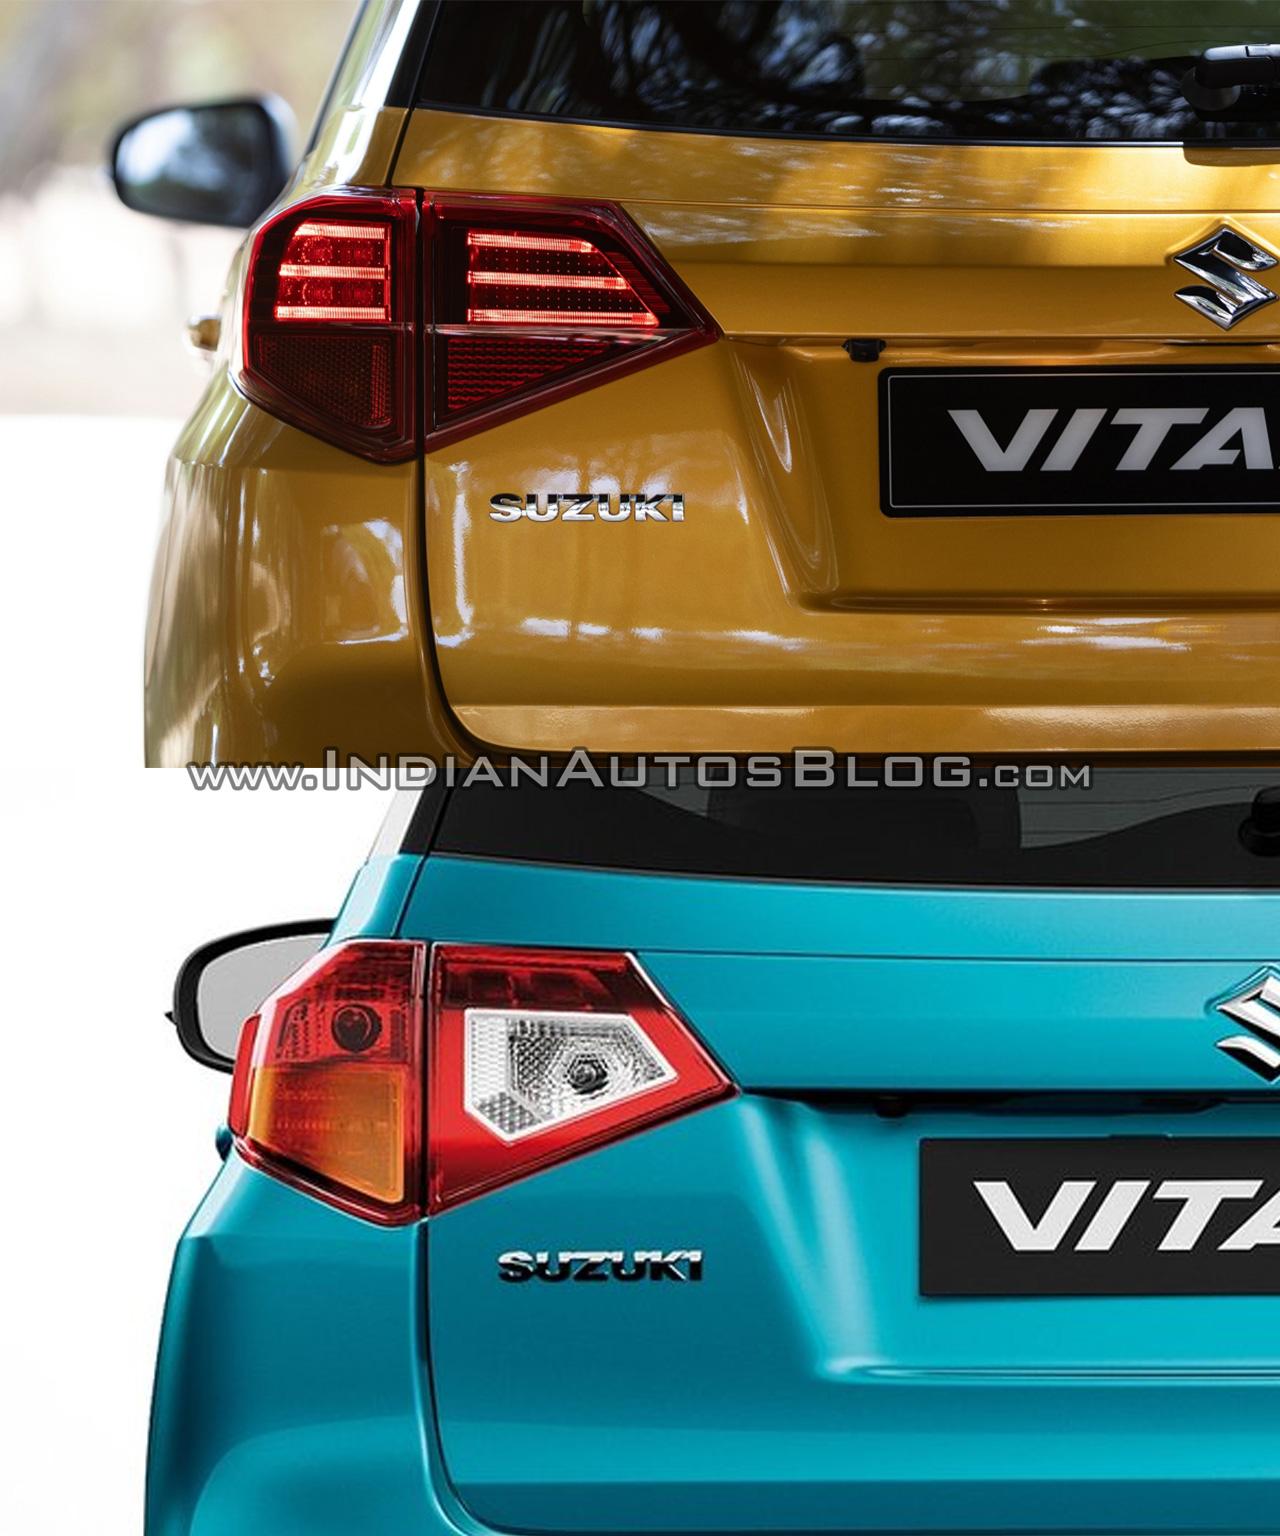 2019 Suzuki Vitara vs. 2015 Suzuki Vitara tail lamp